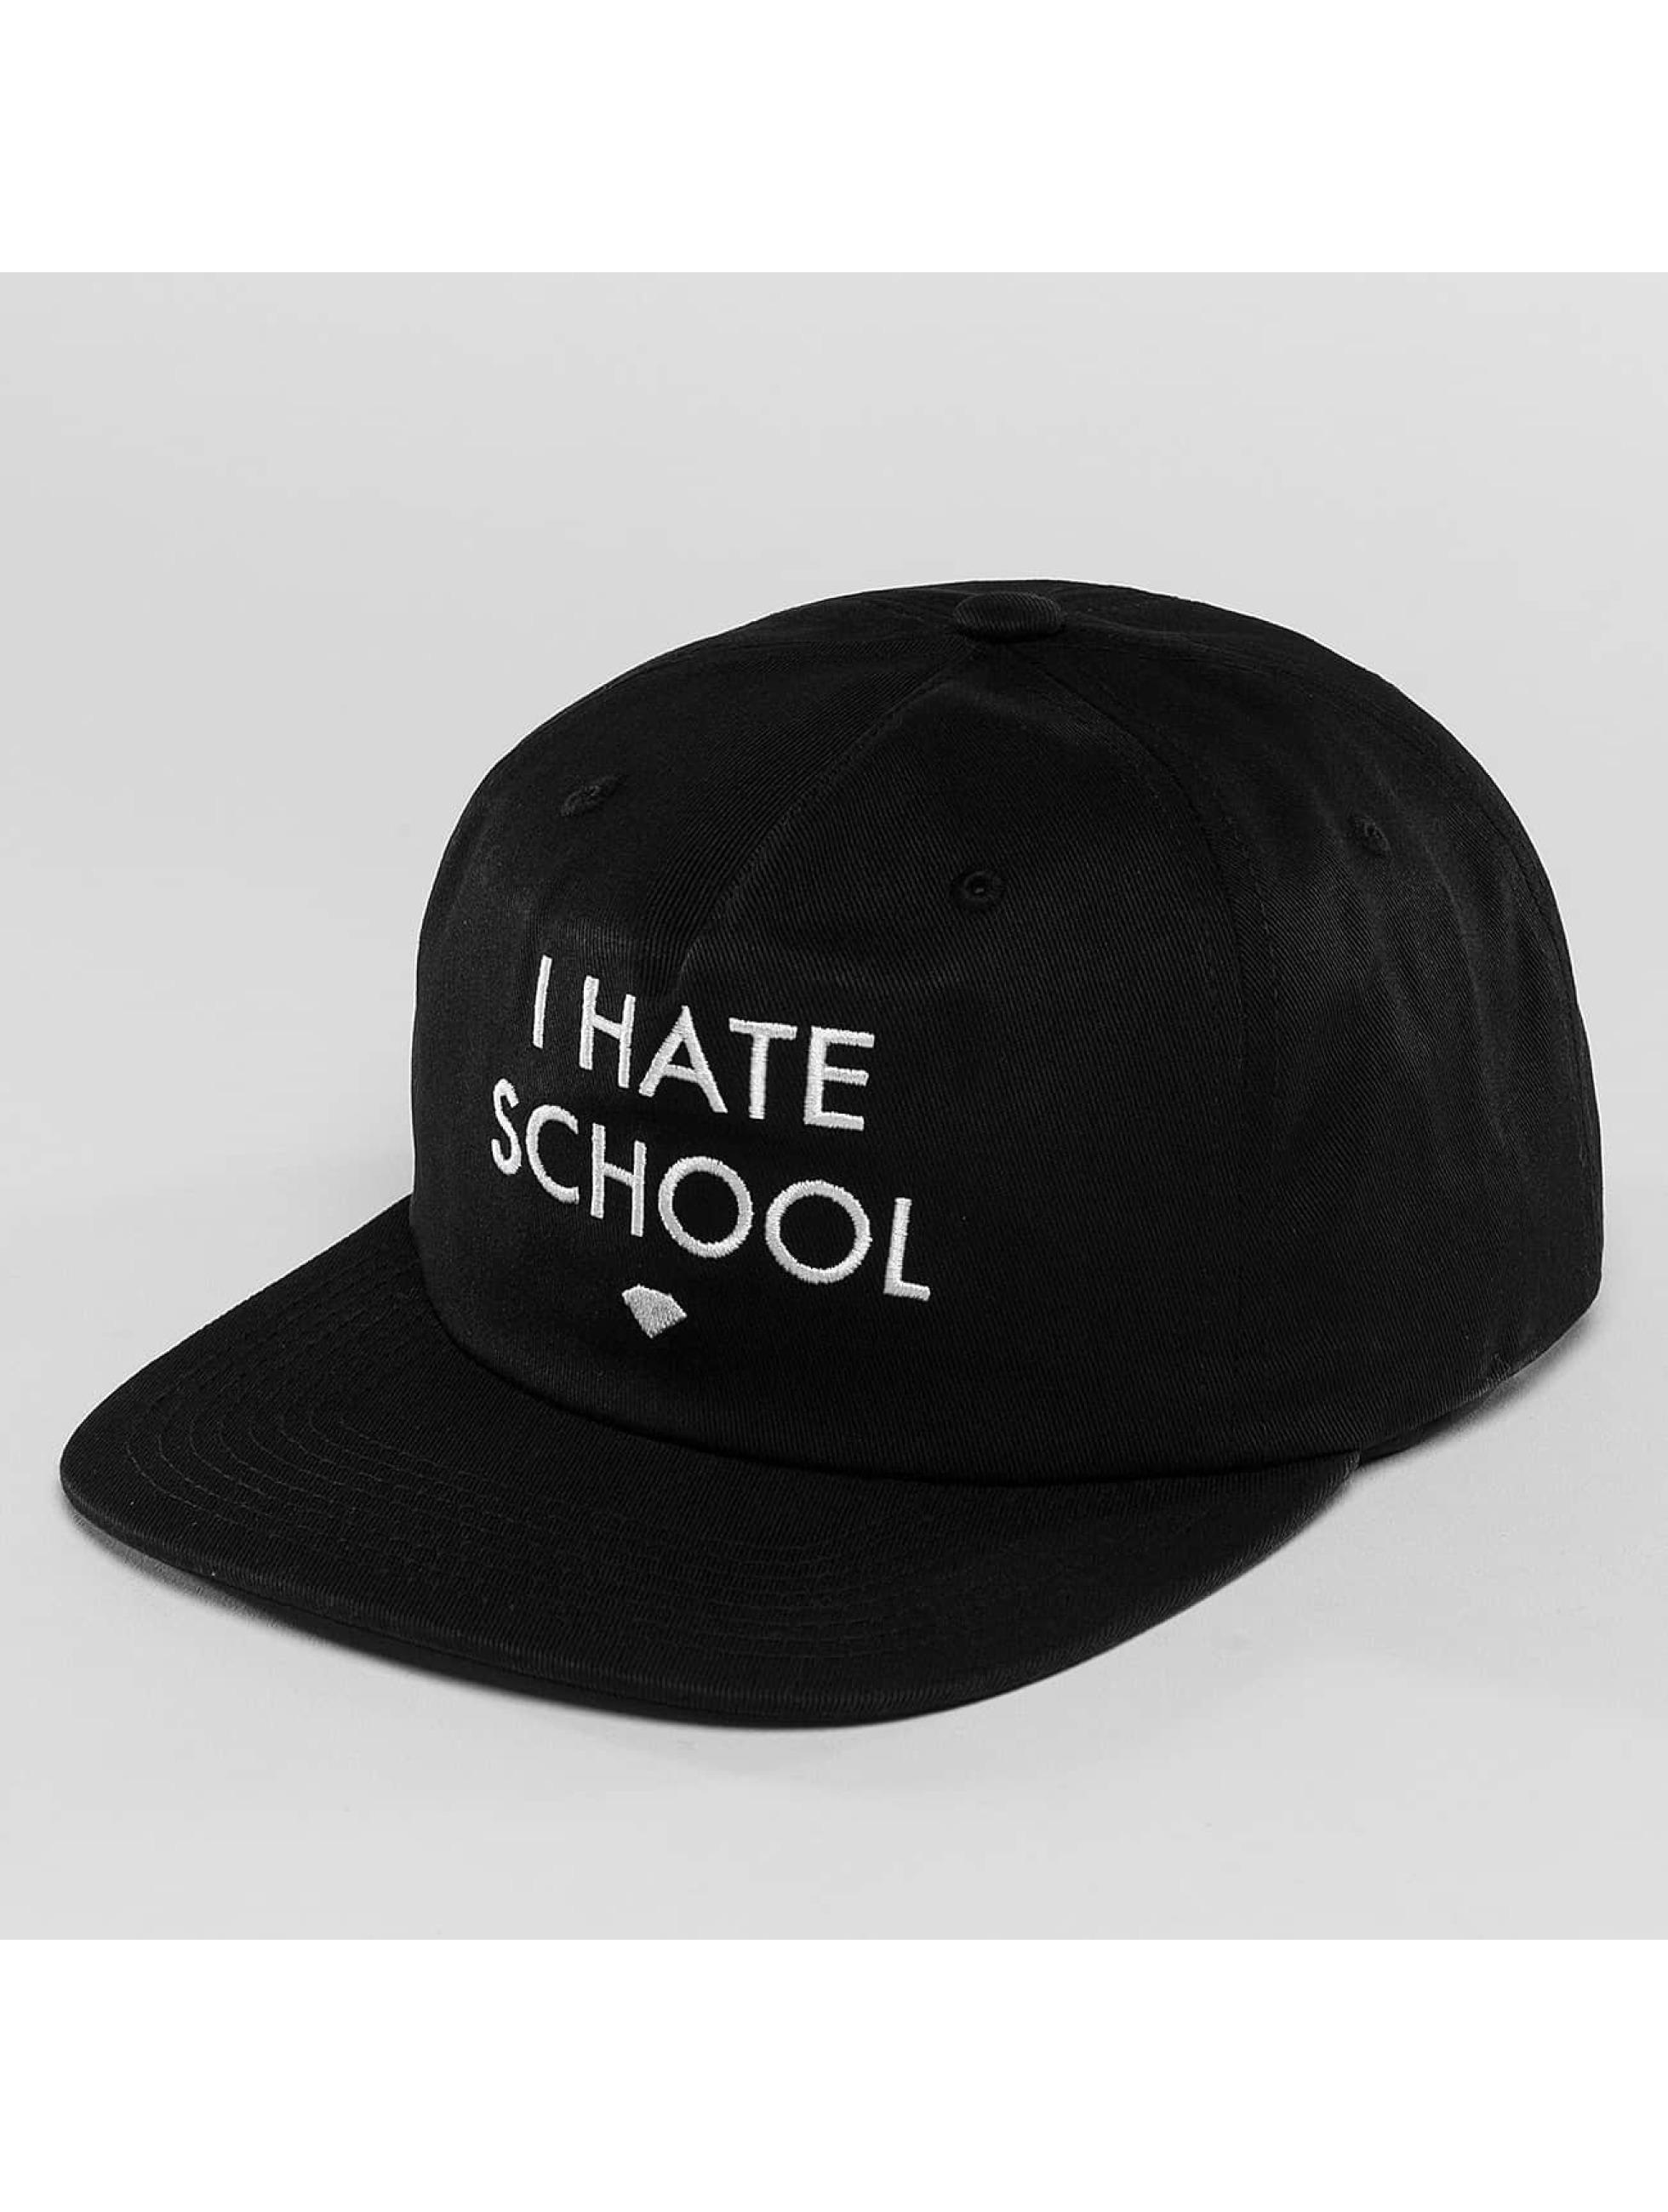 Diamond Männer,Frauen Snapback Cap I Hate School in schwarz